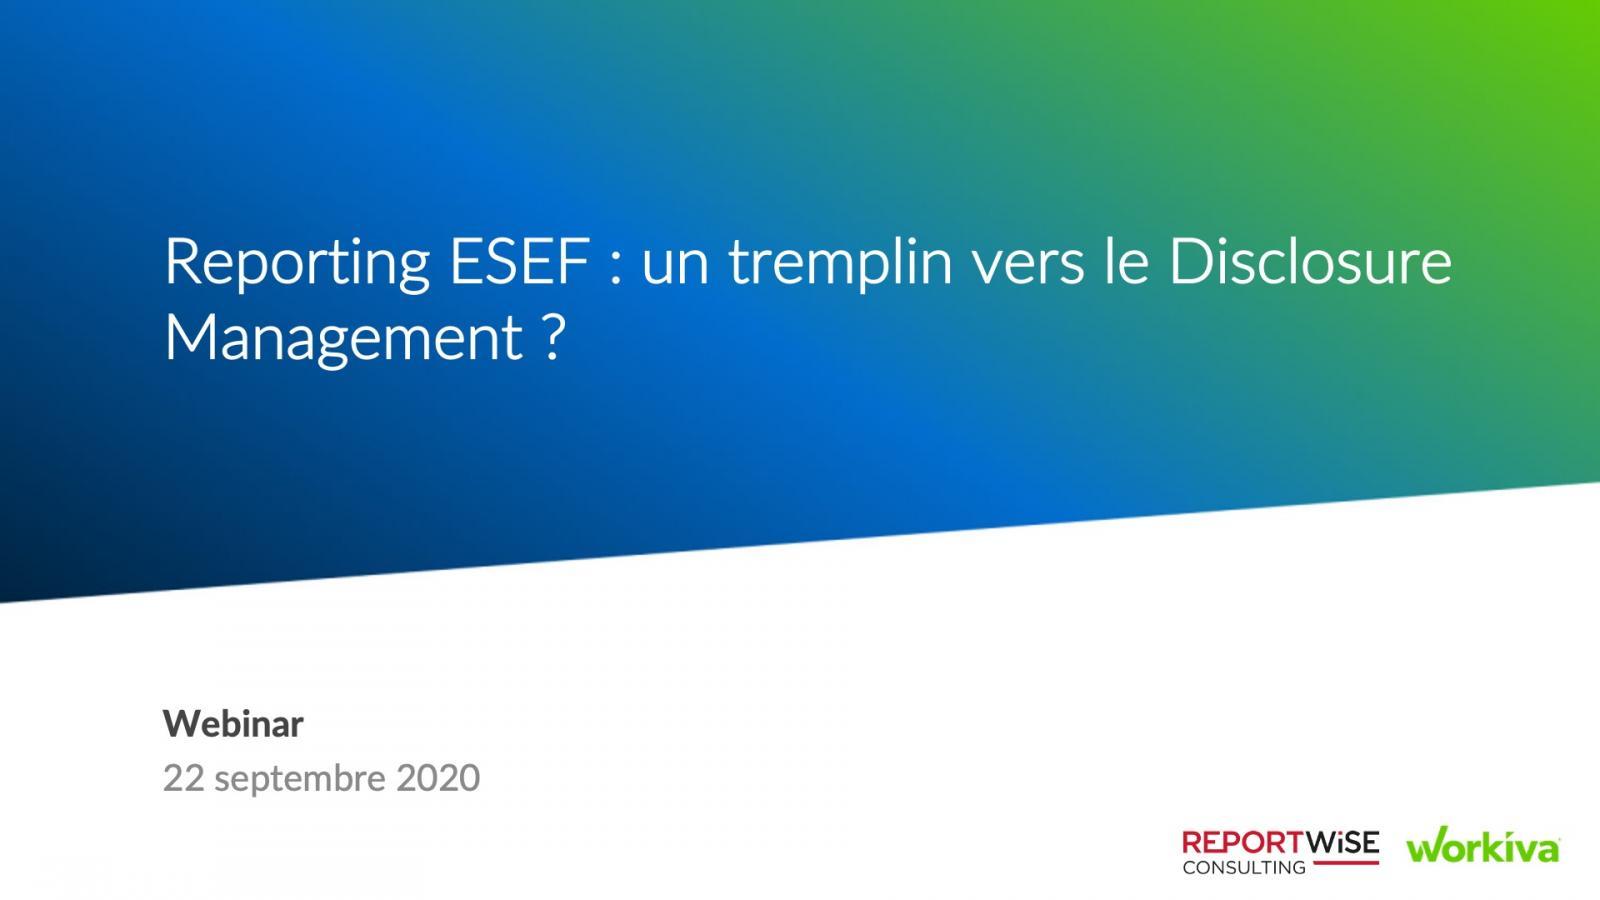 Reportwise ESEF